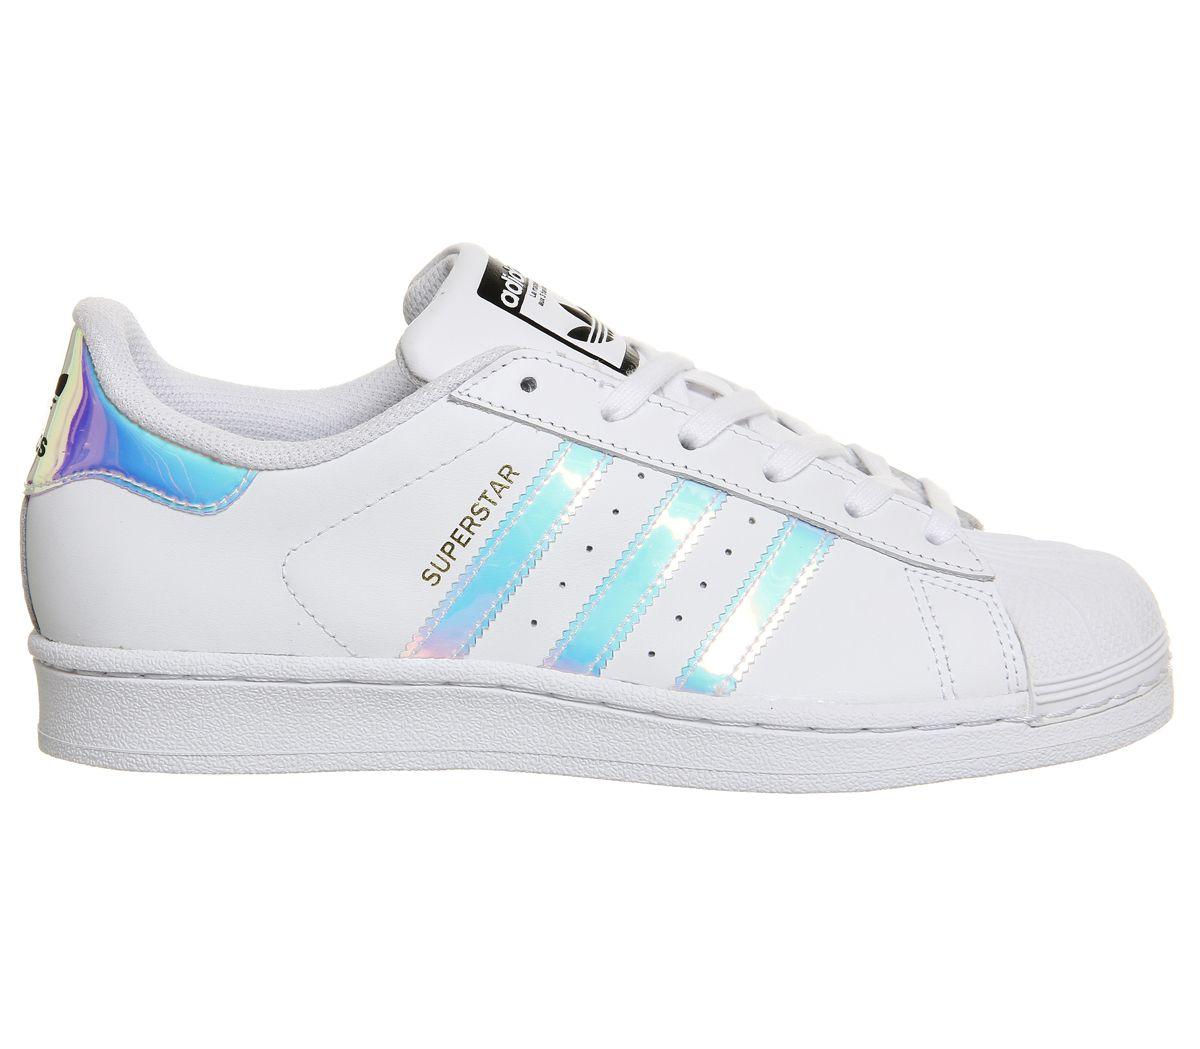 d831c5b4063a Donna-Adidas-Superstar-Bianco-Argento-Metallizzato miniatura 4